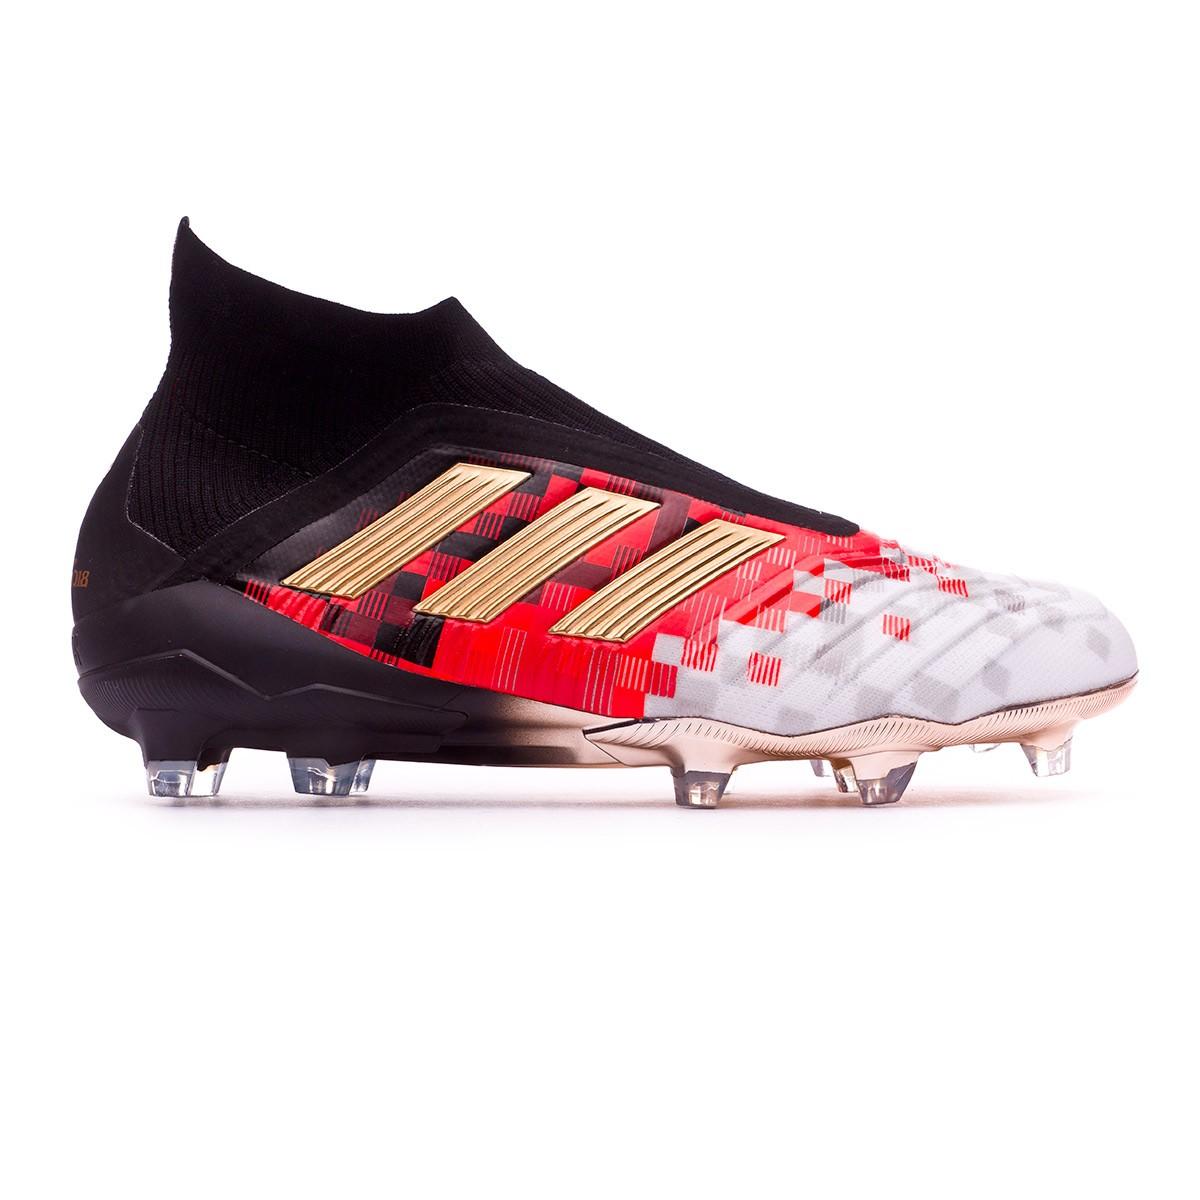 72d38707d8db Football Boots adidas Telstar Predator 18+ Black-Copper metallic-Solar grey  - Football store Fútbol Emotion